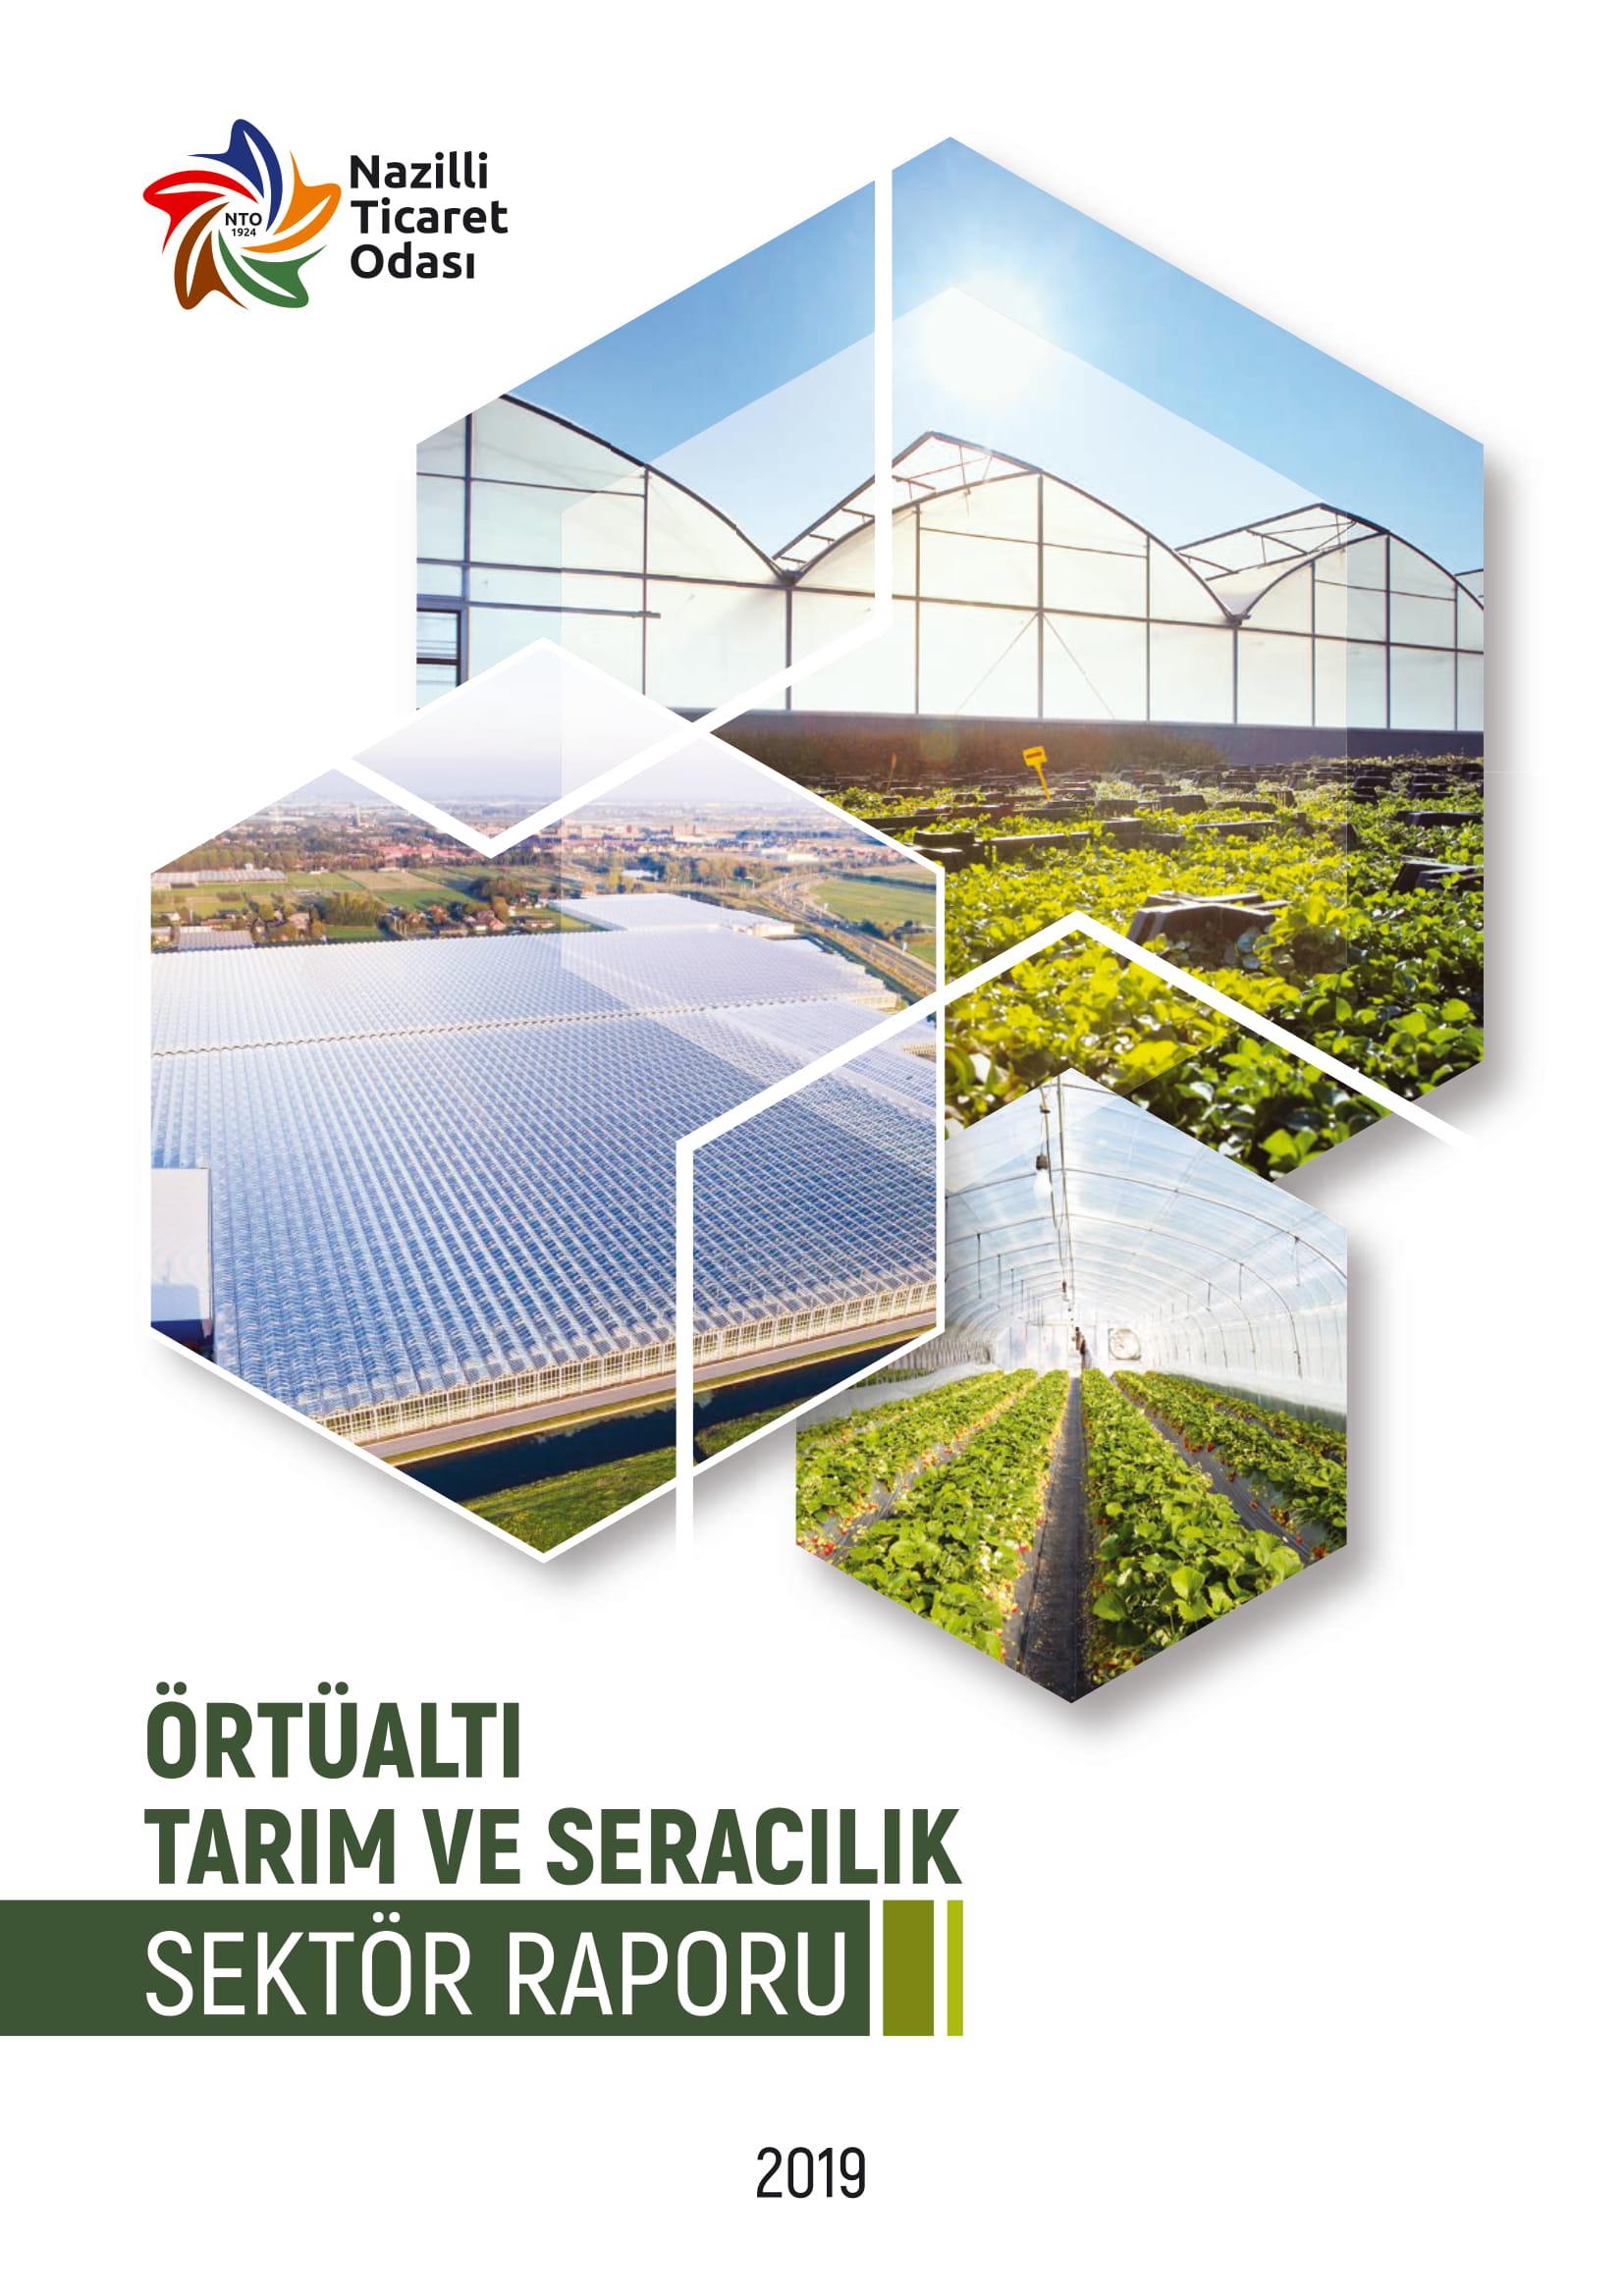 ortualti-tarim-seracilik-sektor-raporu-01